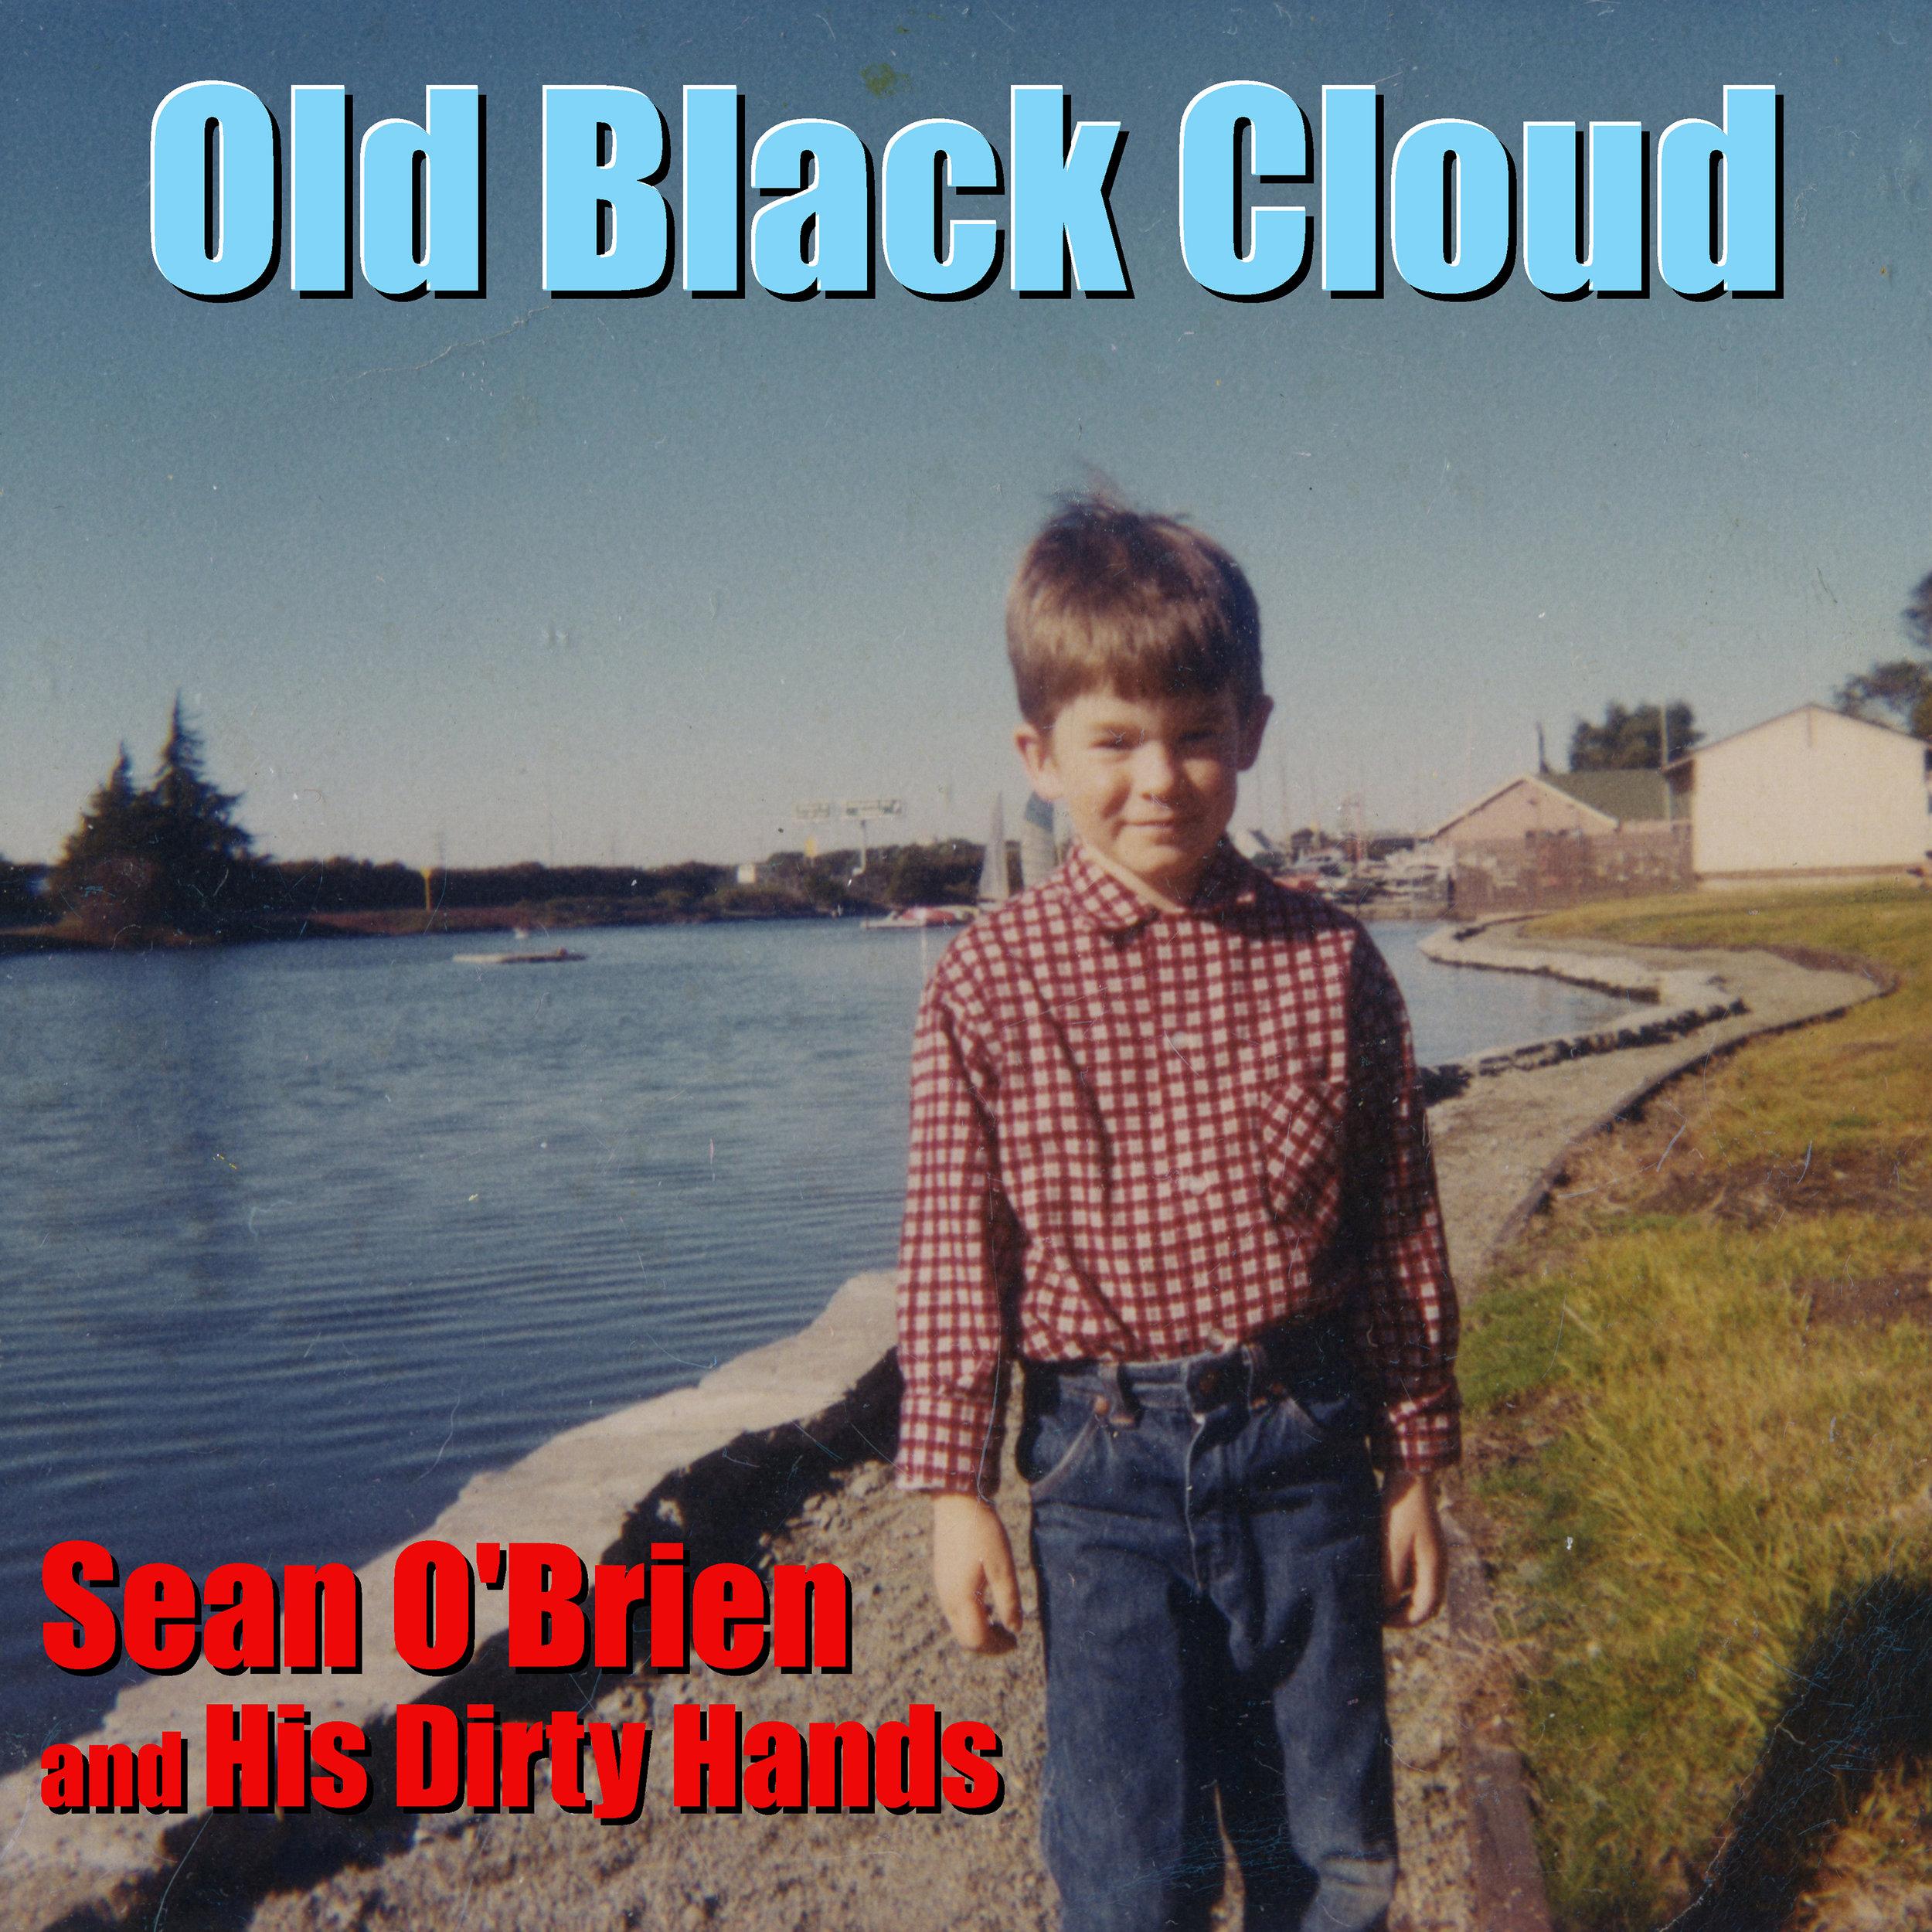 Old Black Cloud - Digital Single